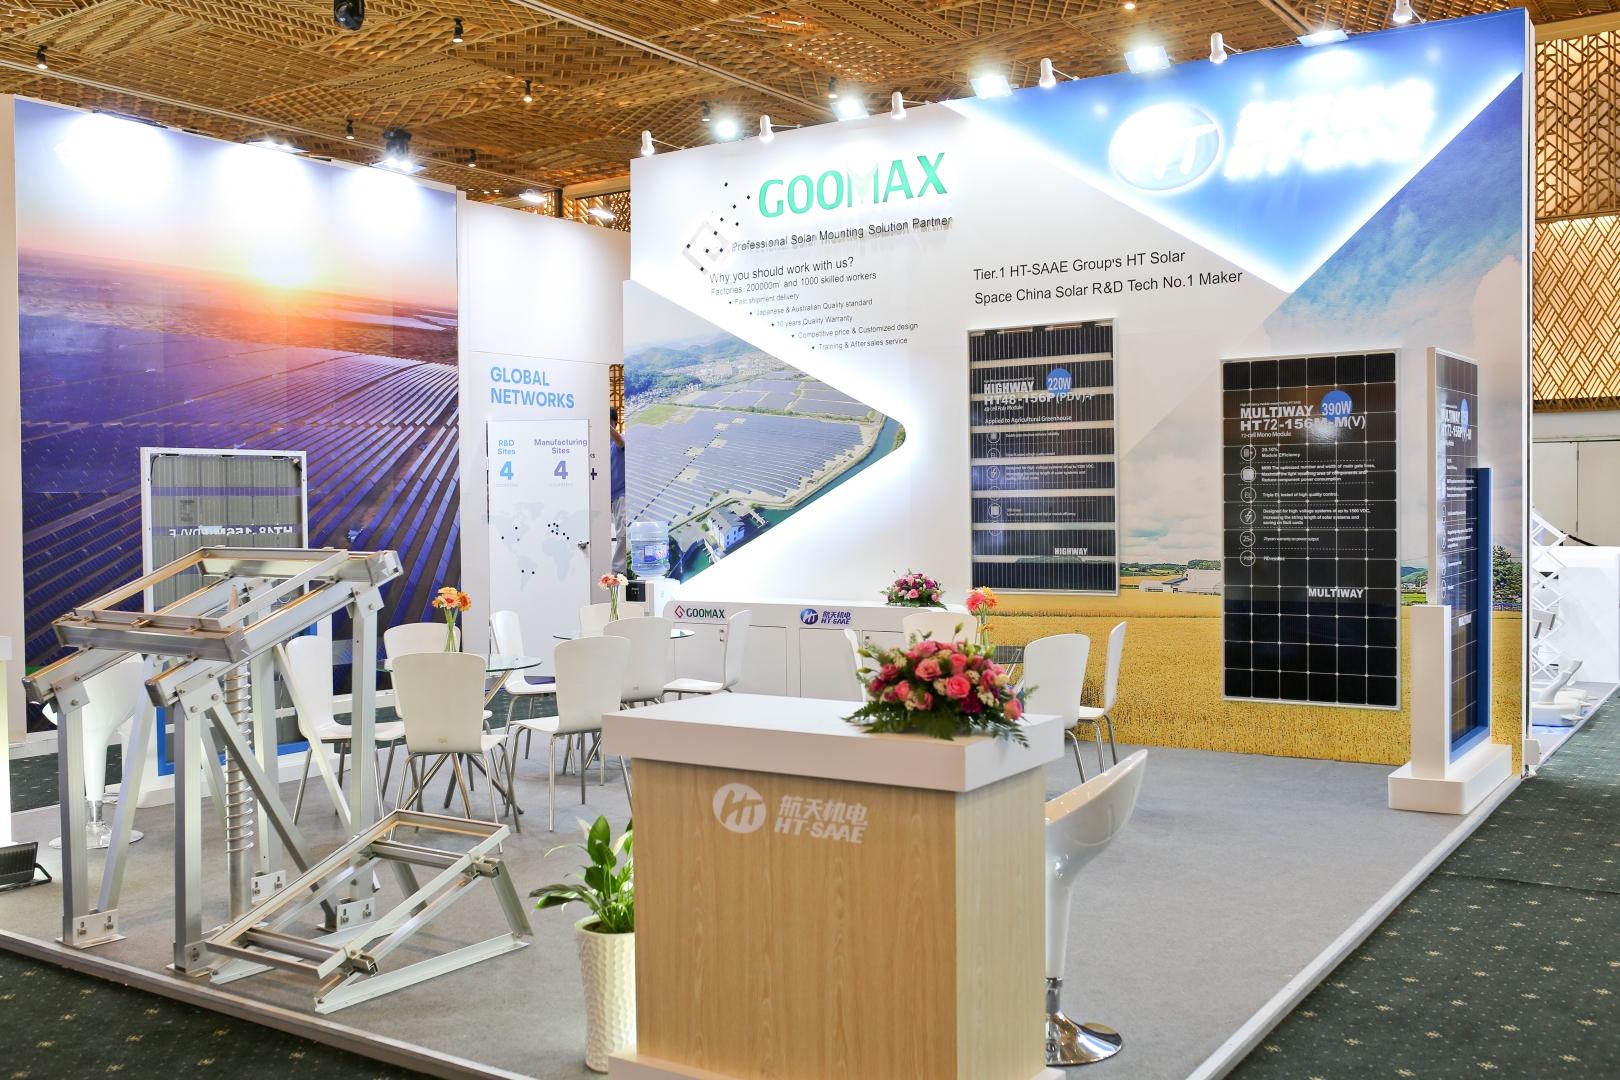 TRIỂN LÃM THE SOLAR SHOW VIETNAM 2020